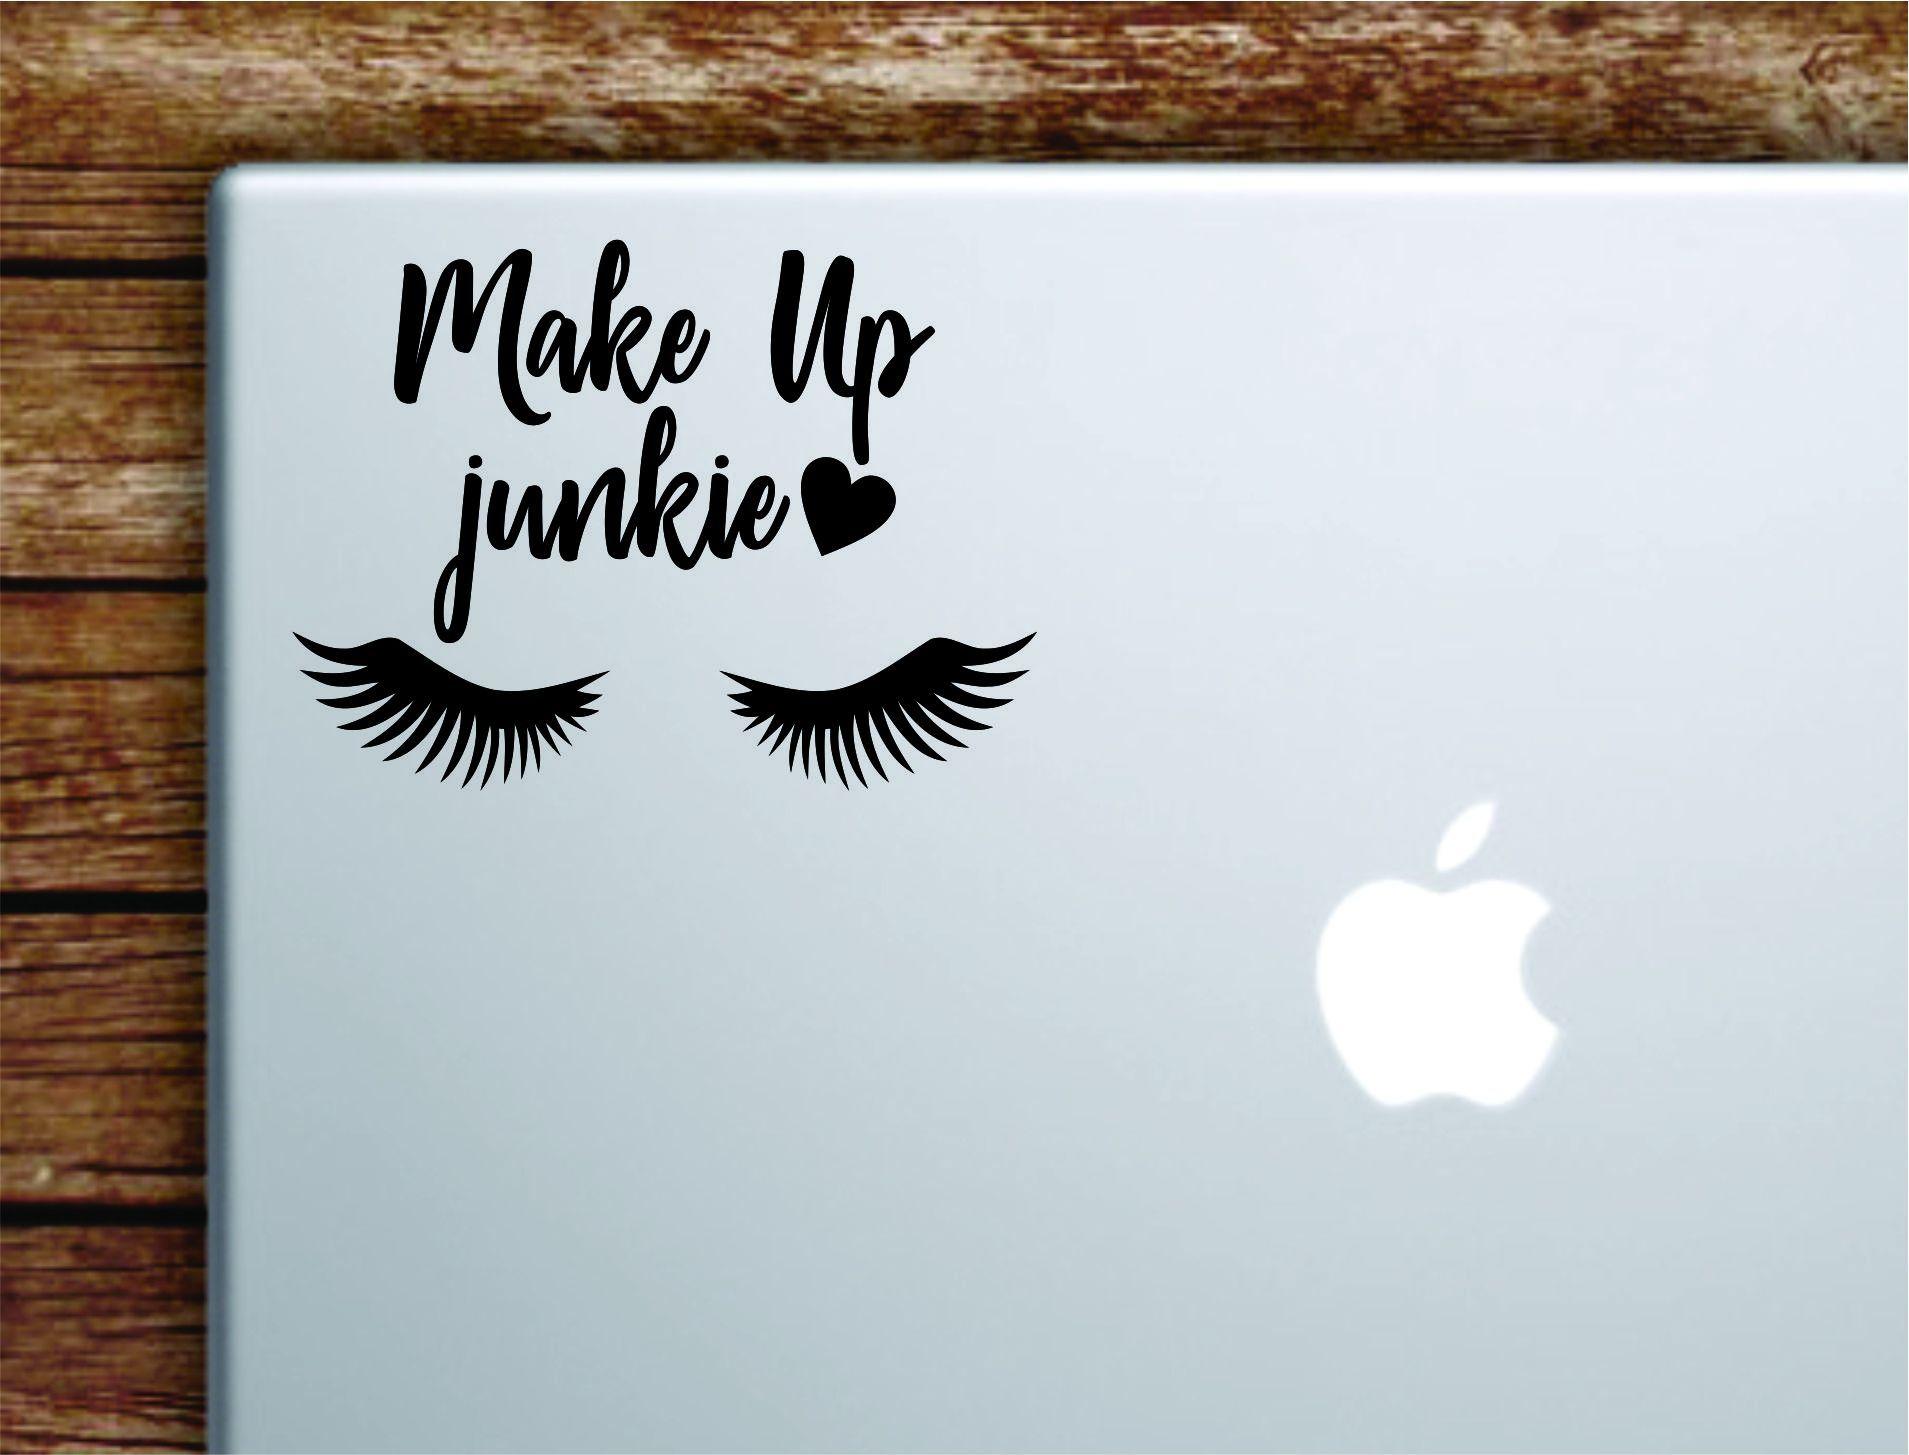 Make Up Junkie Laptop Decal Sticker Vinyl Art Quote Macbook Apple Decor Car Window Truck Girls Beauty Lashes Teen - orange